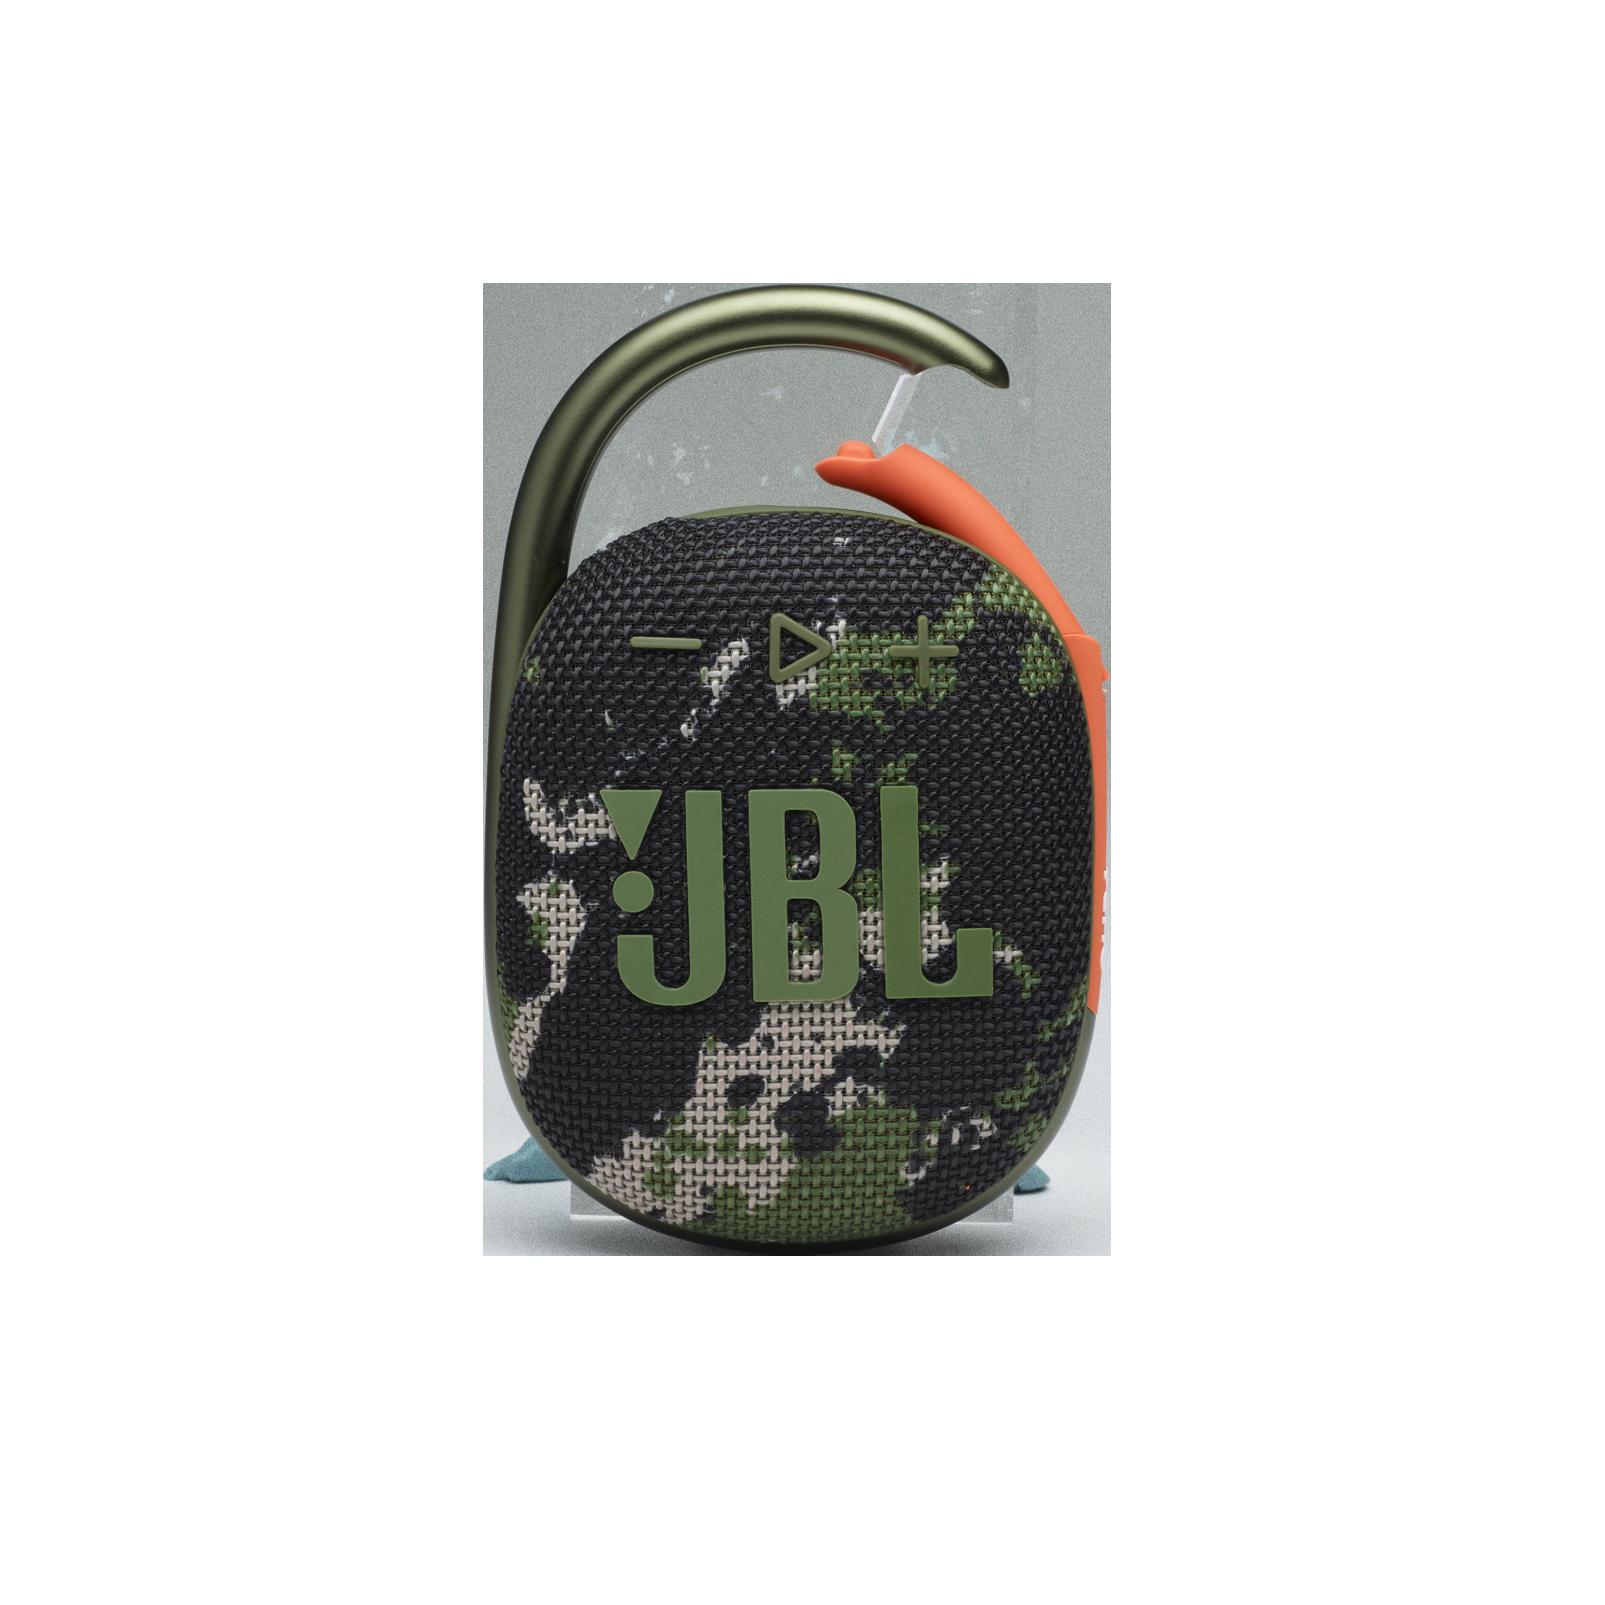 JBL CLIP 4 - Squad - Ultra-portable Waterproof Speaker - Front